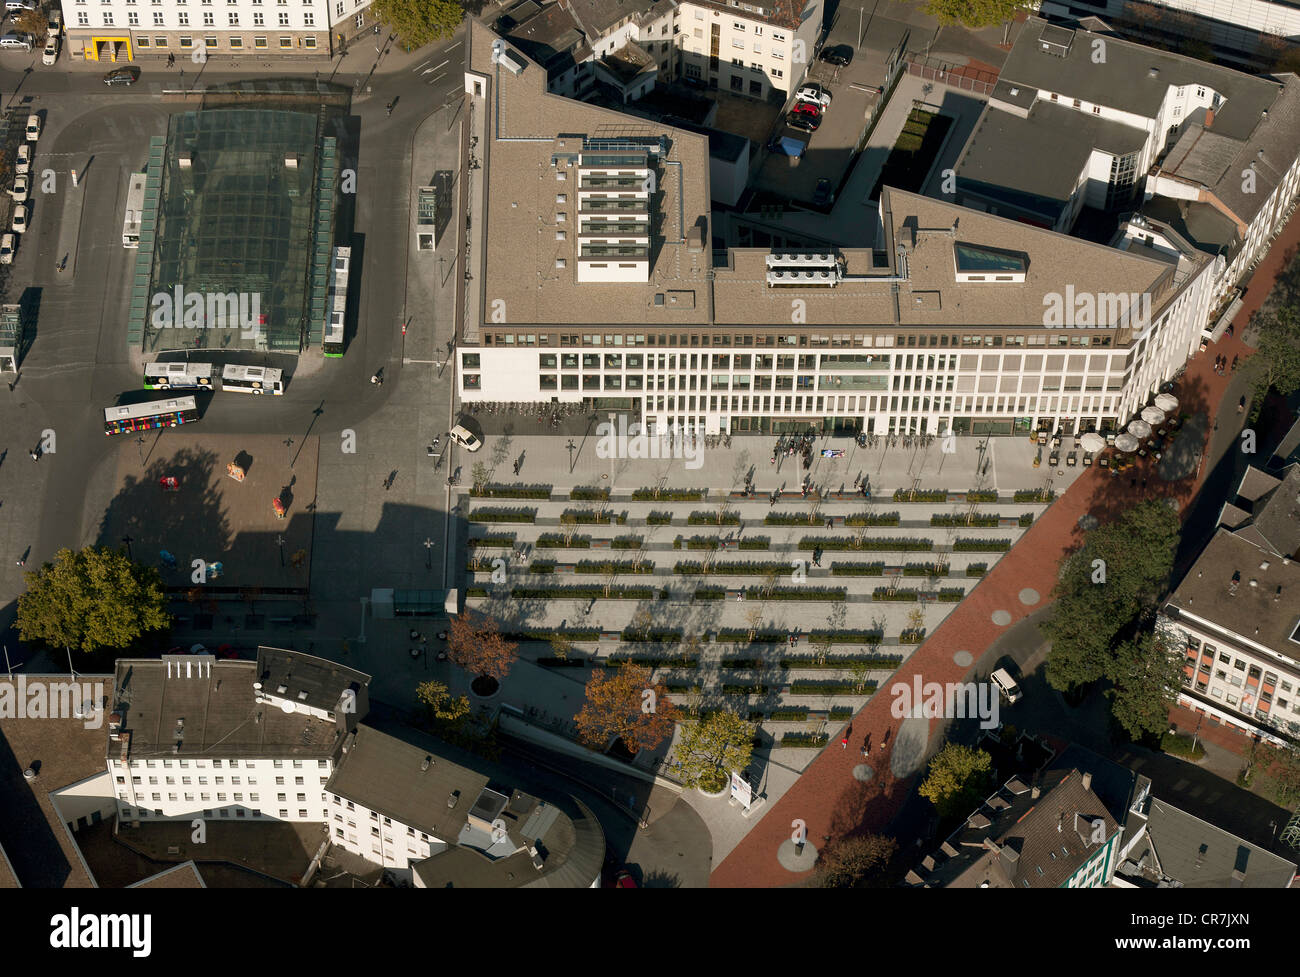 Aerial view, town redevelopment, Heinrich-von-Kleist-Forum, library and adult education centre, Hamm, Ruhr Area - Stock Image